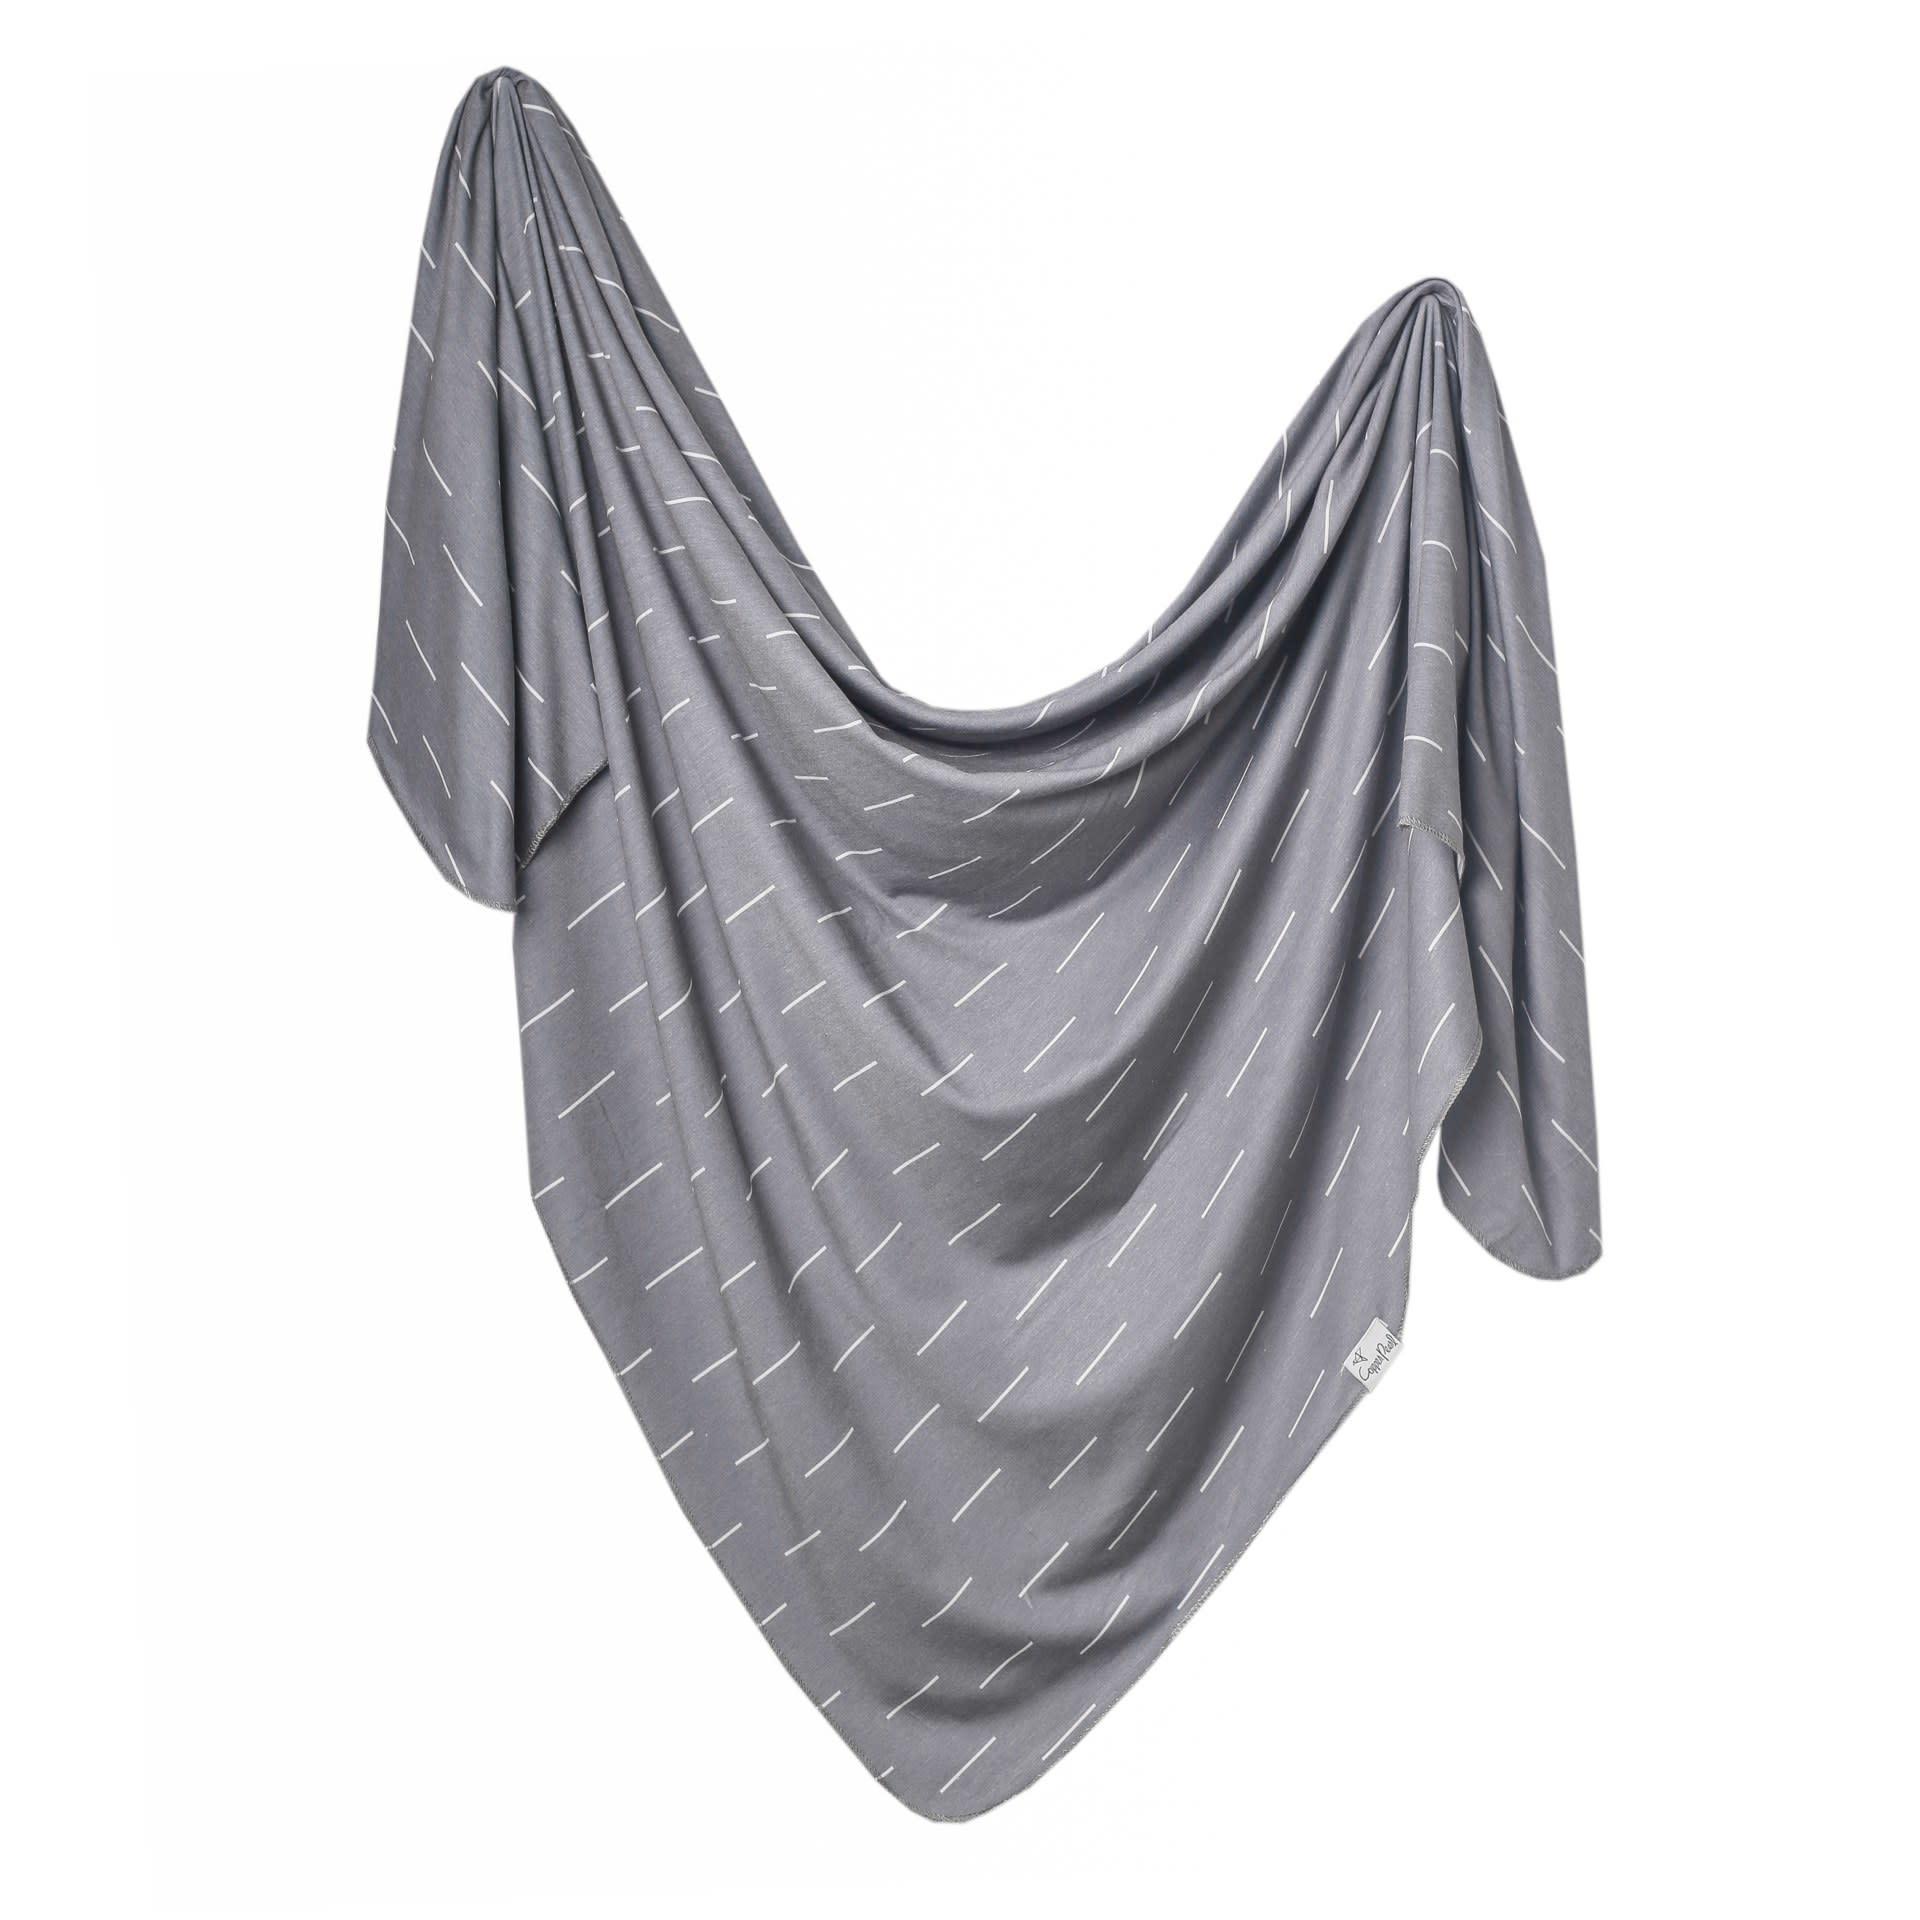 Copper Pearl Knit Blanket - Dash